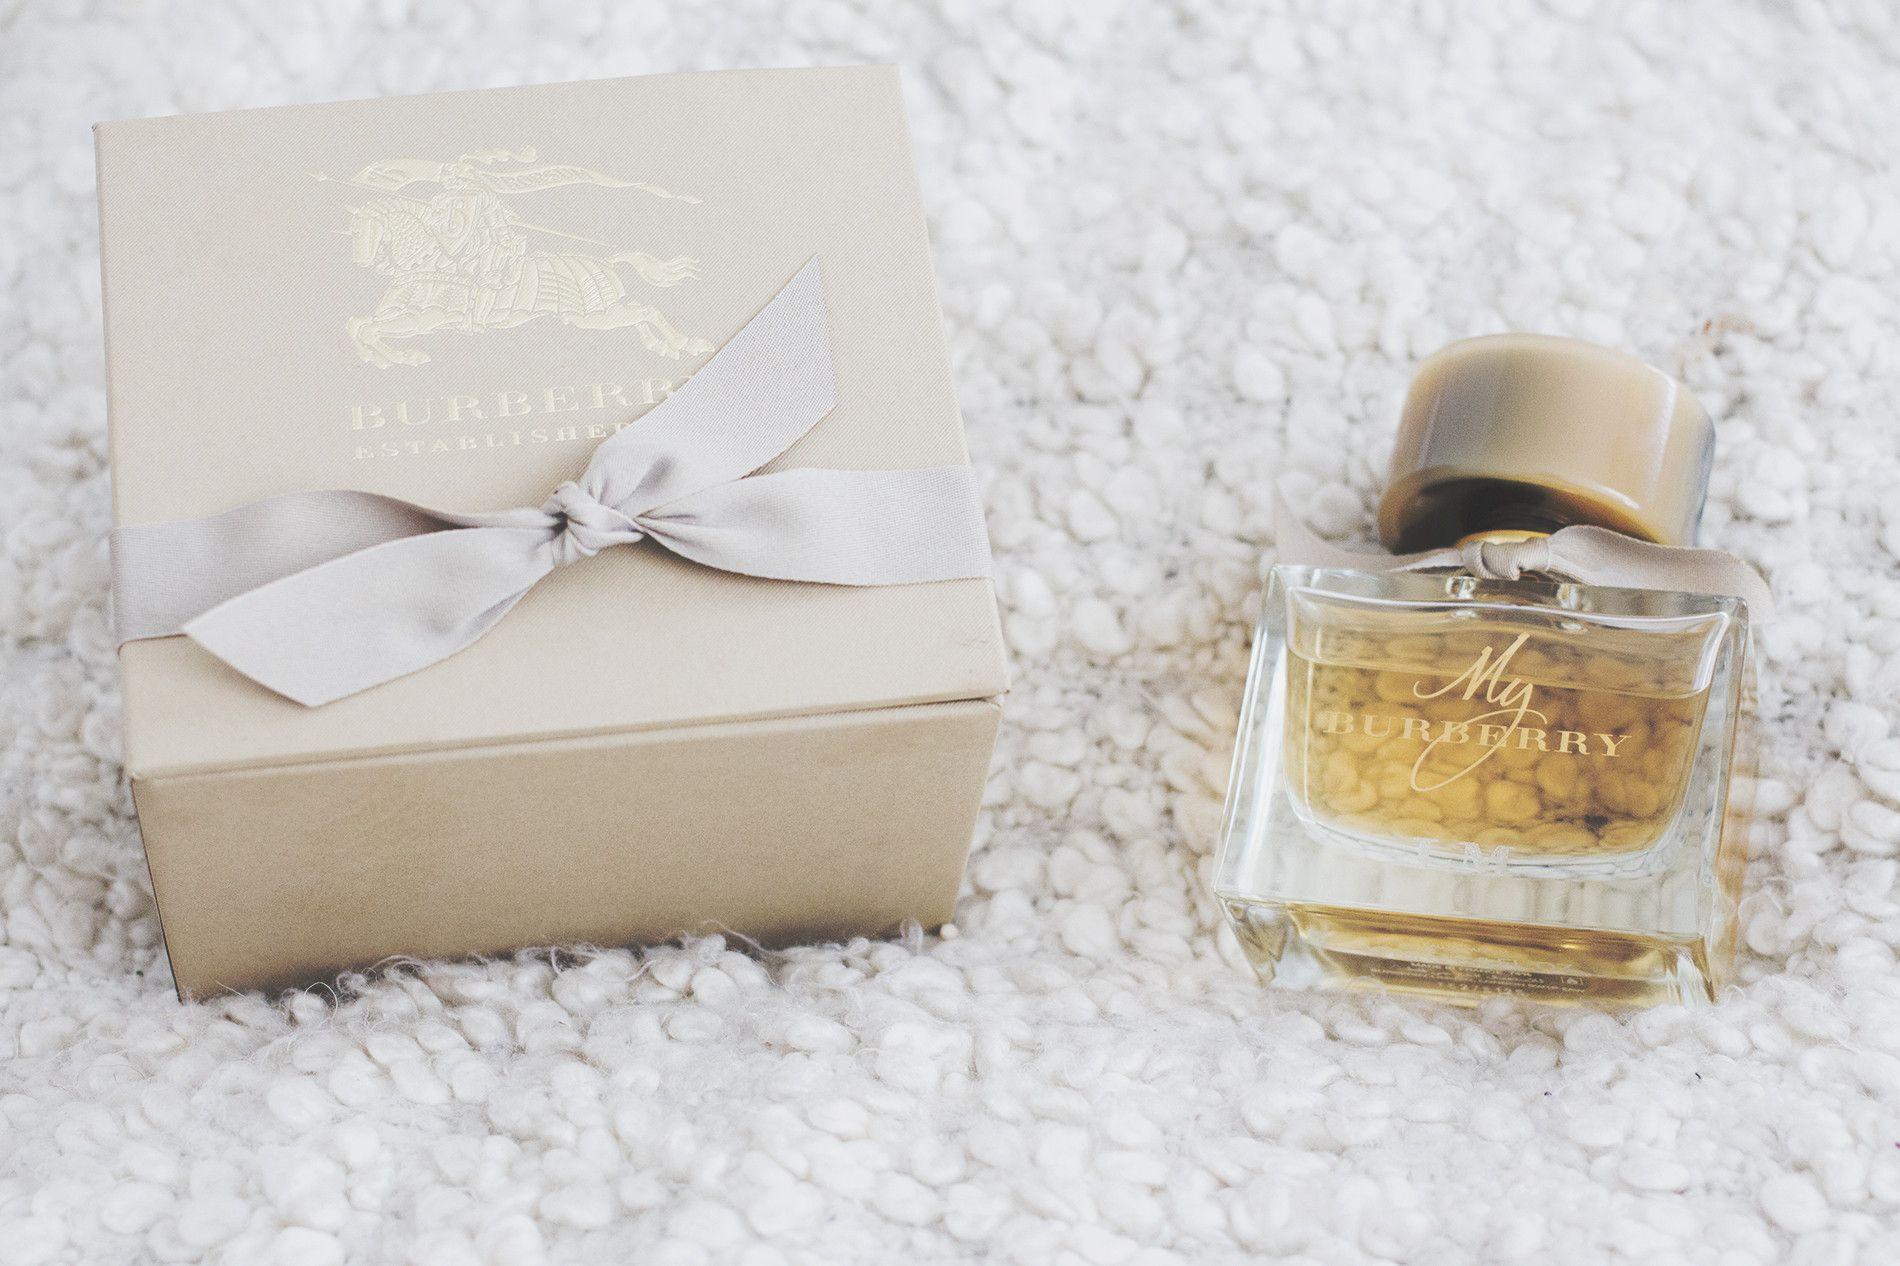 FREE My Burberry Blush Perfume Sample Link ==> https://goo.gl/hKU6gd ...